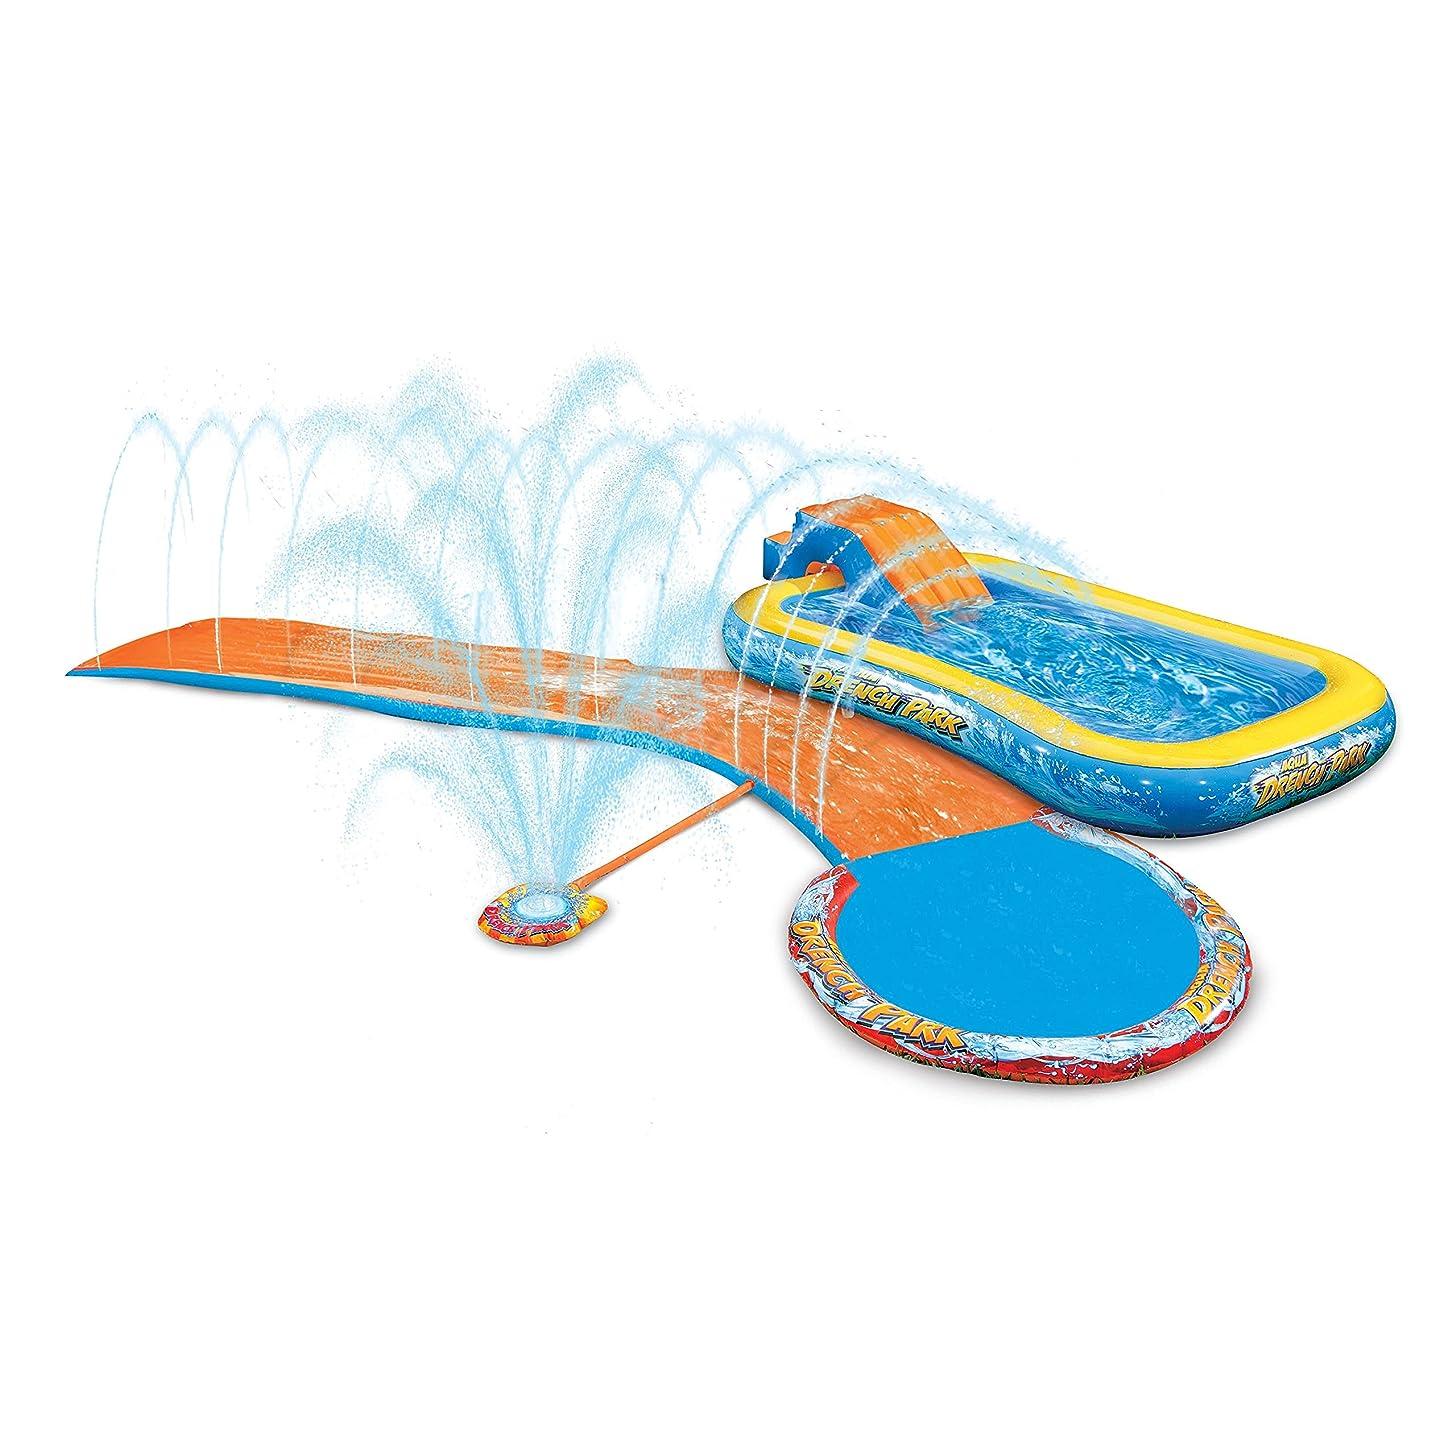 Banzai Inflatable Aqua Drench 3-in-1 Splash Park (Sprinkler, Slide and Pool)